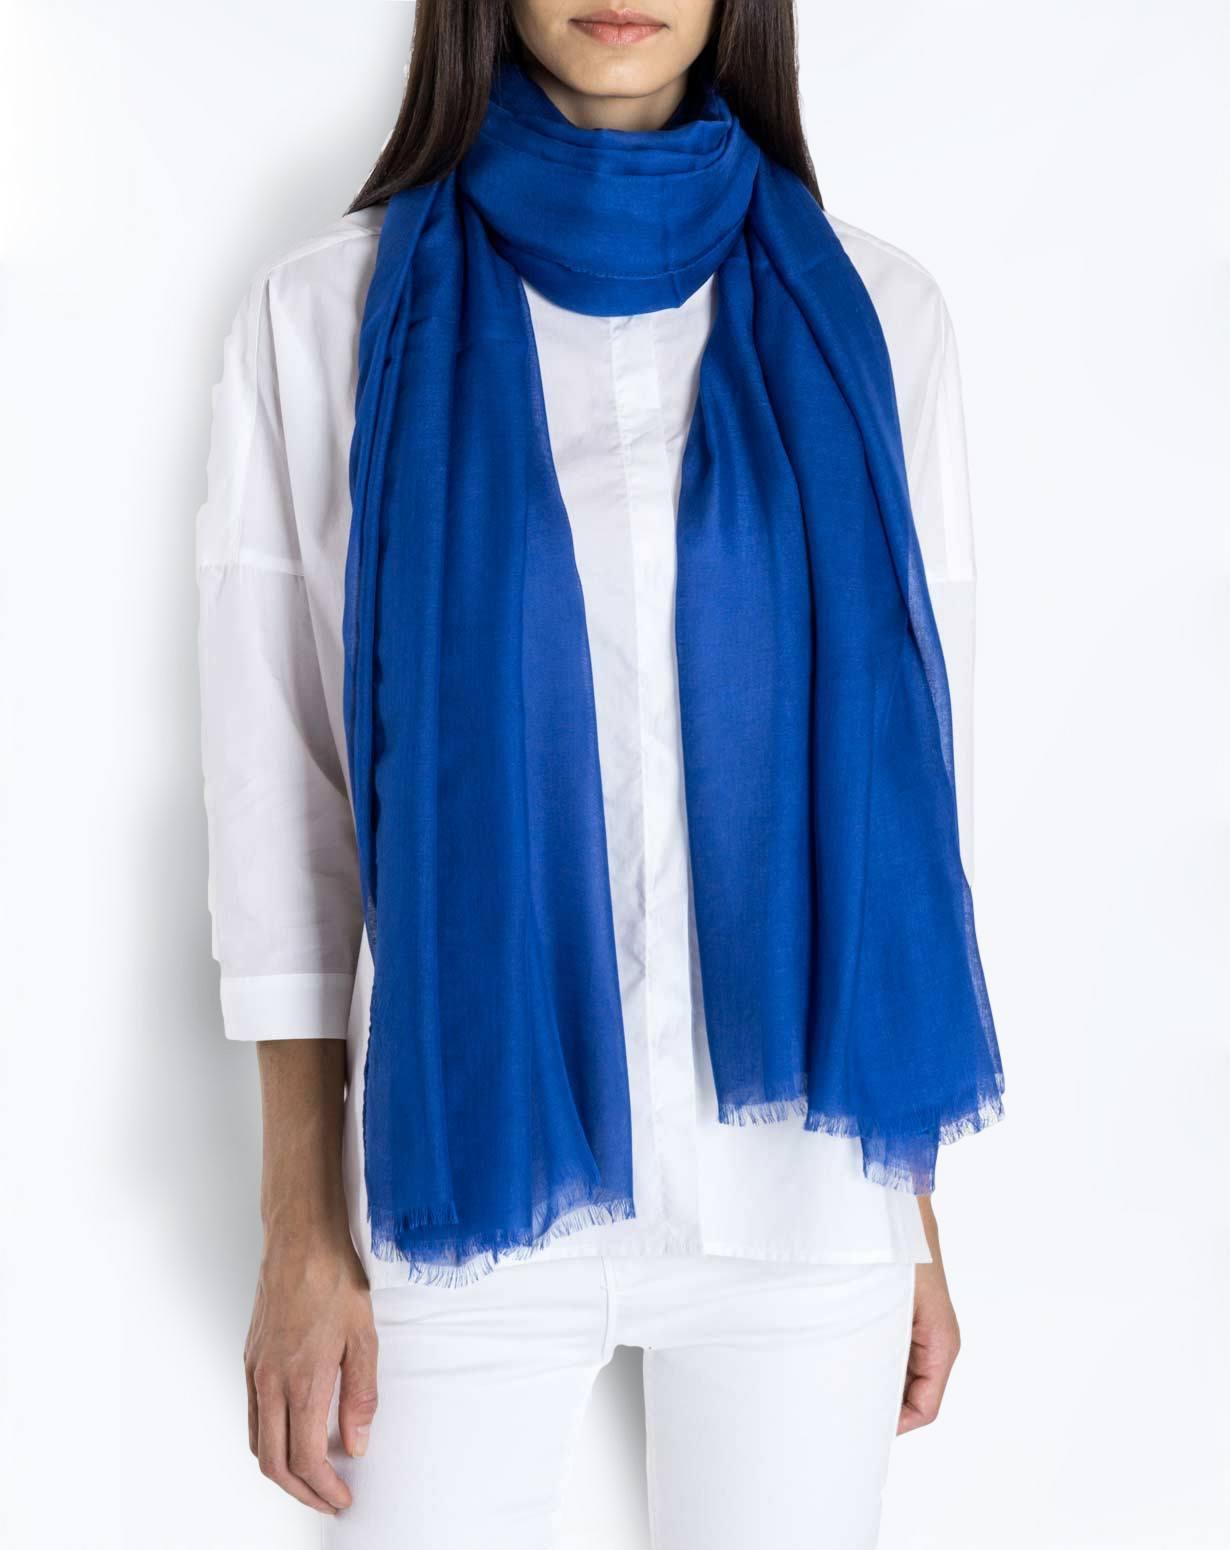 Cashmere Blend Pashmina - Cornflower Blue